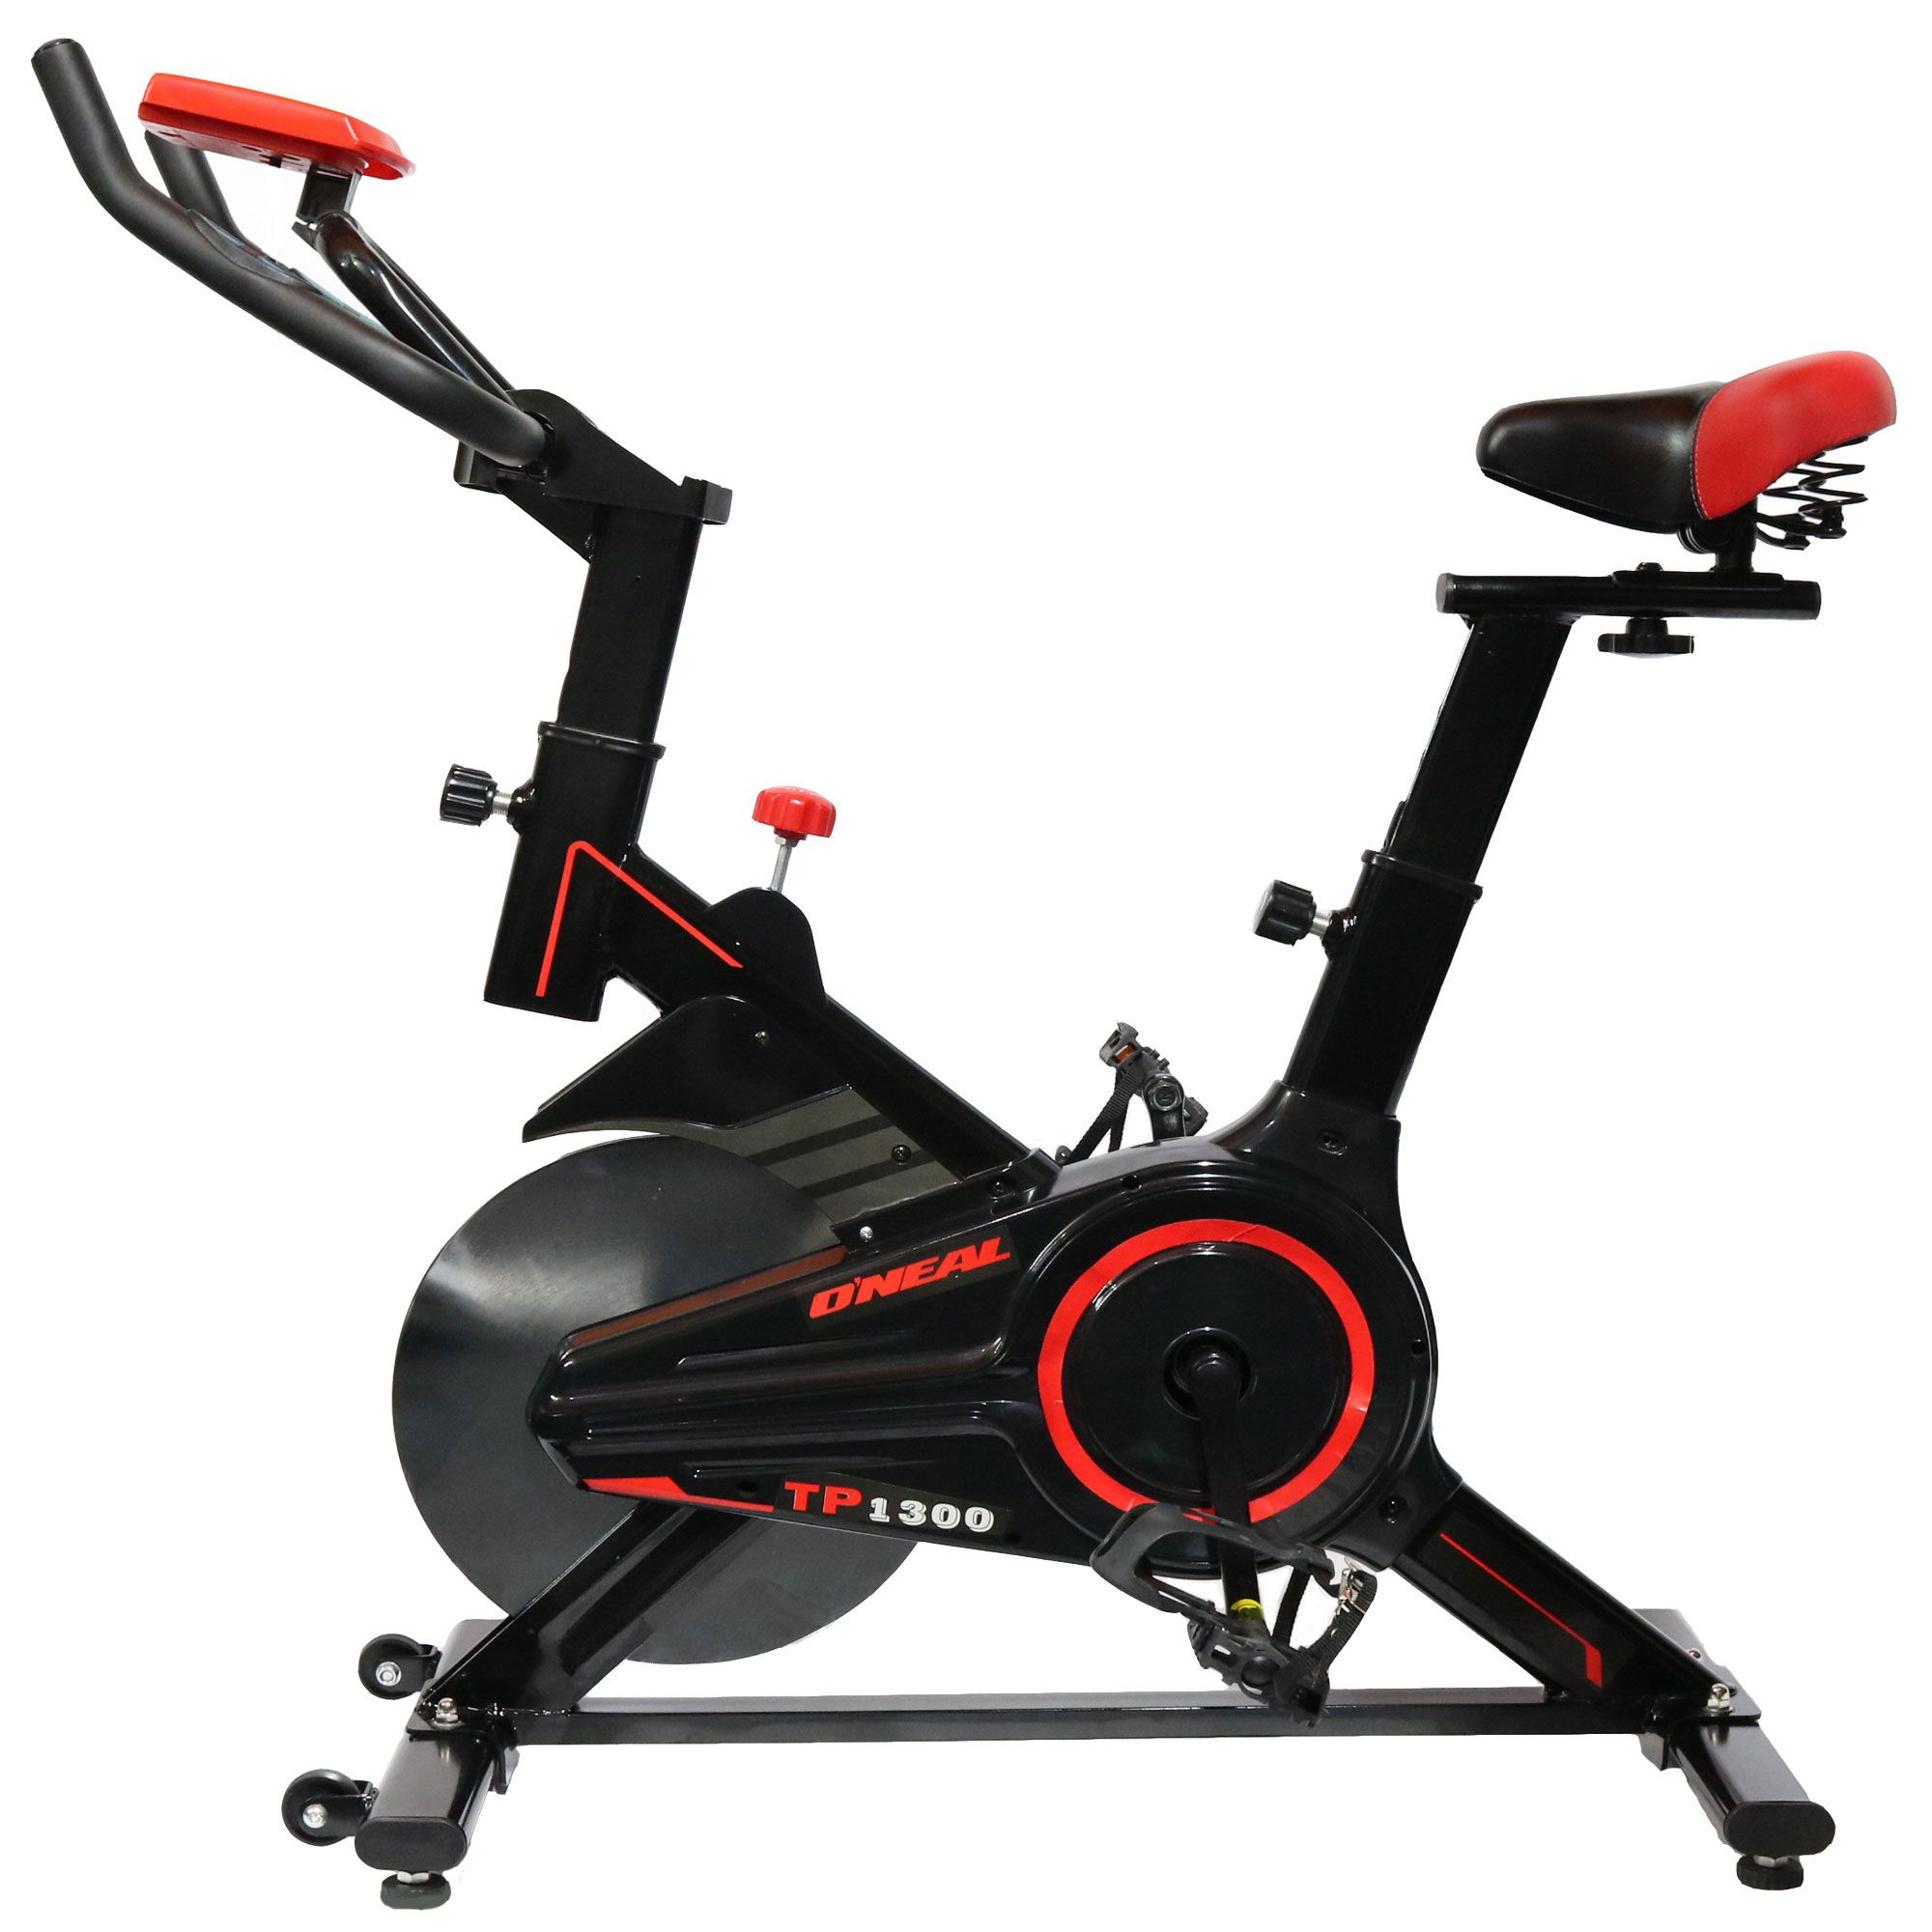 Bicicleta ergometrica spinning preta 90kg oneal tp1300